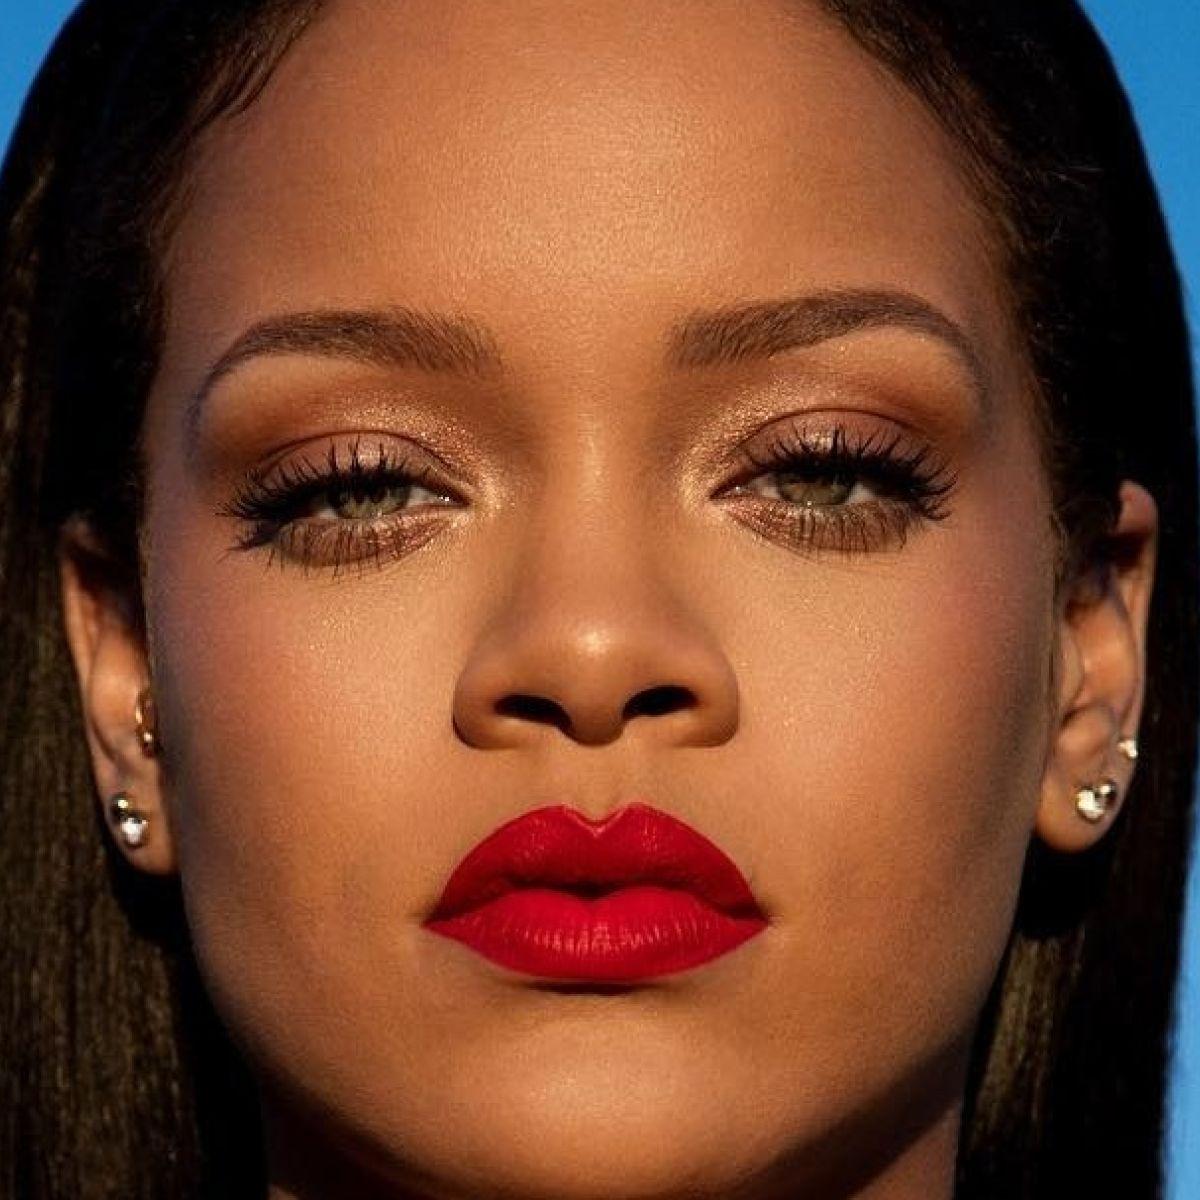 Watch Best of the Week: Rihanna's Orange Lip, Kim Kardashian's Birthday Glam,More video